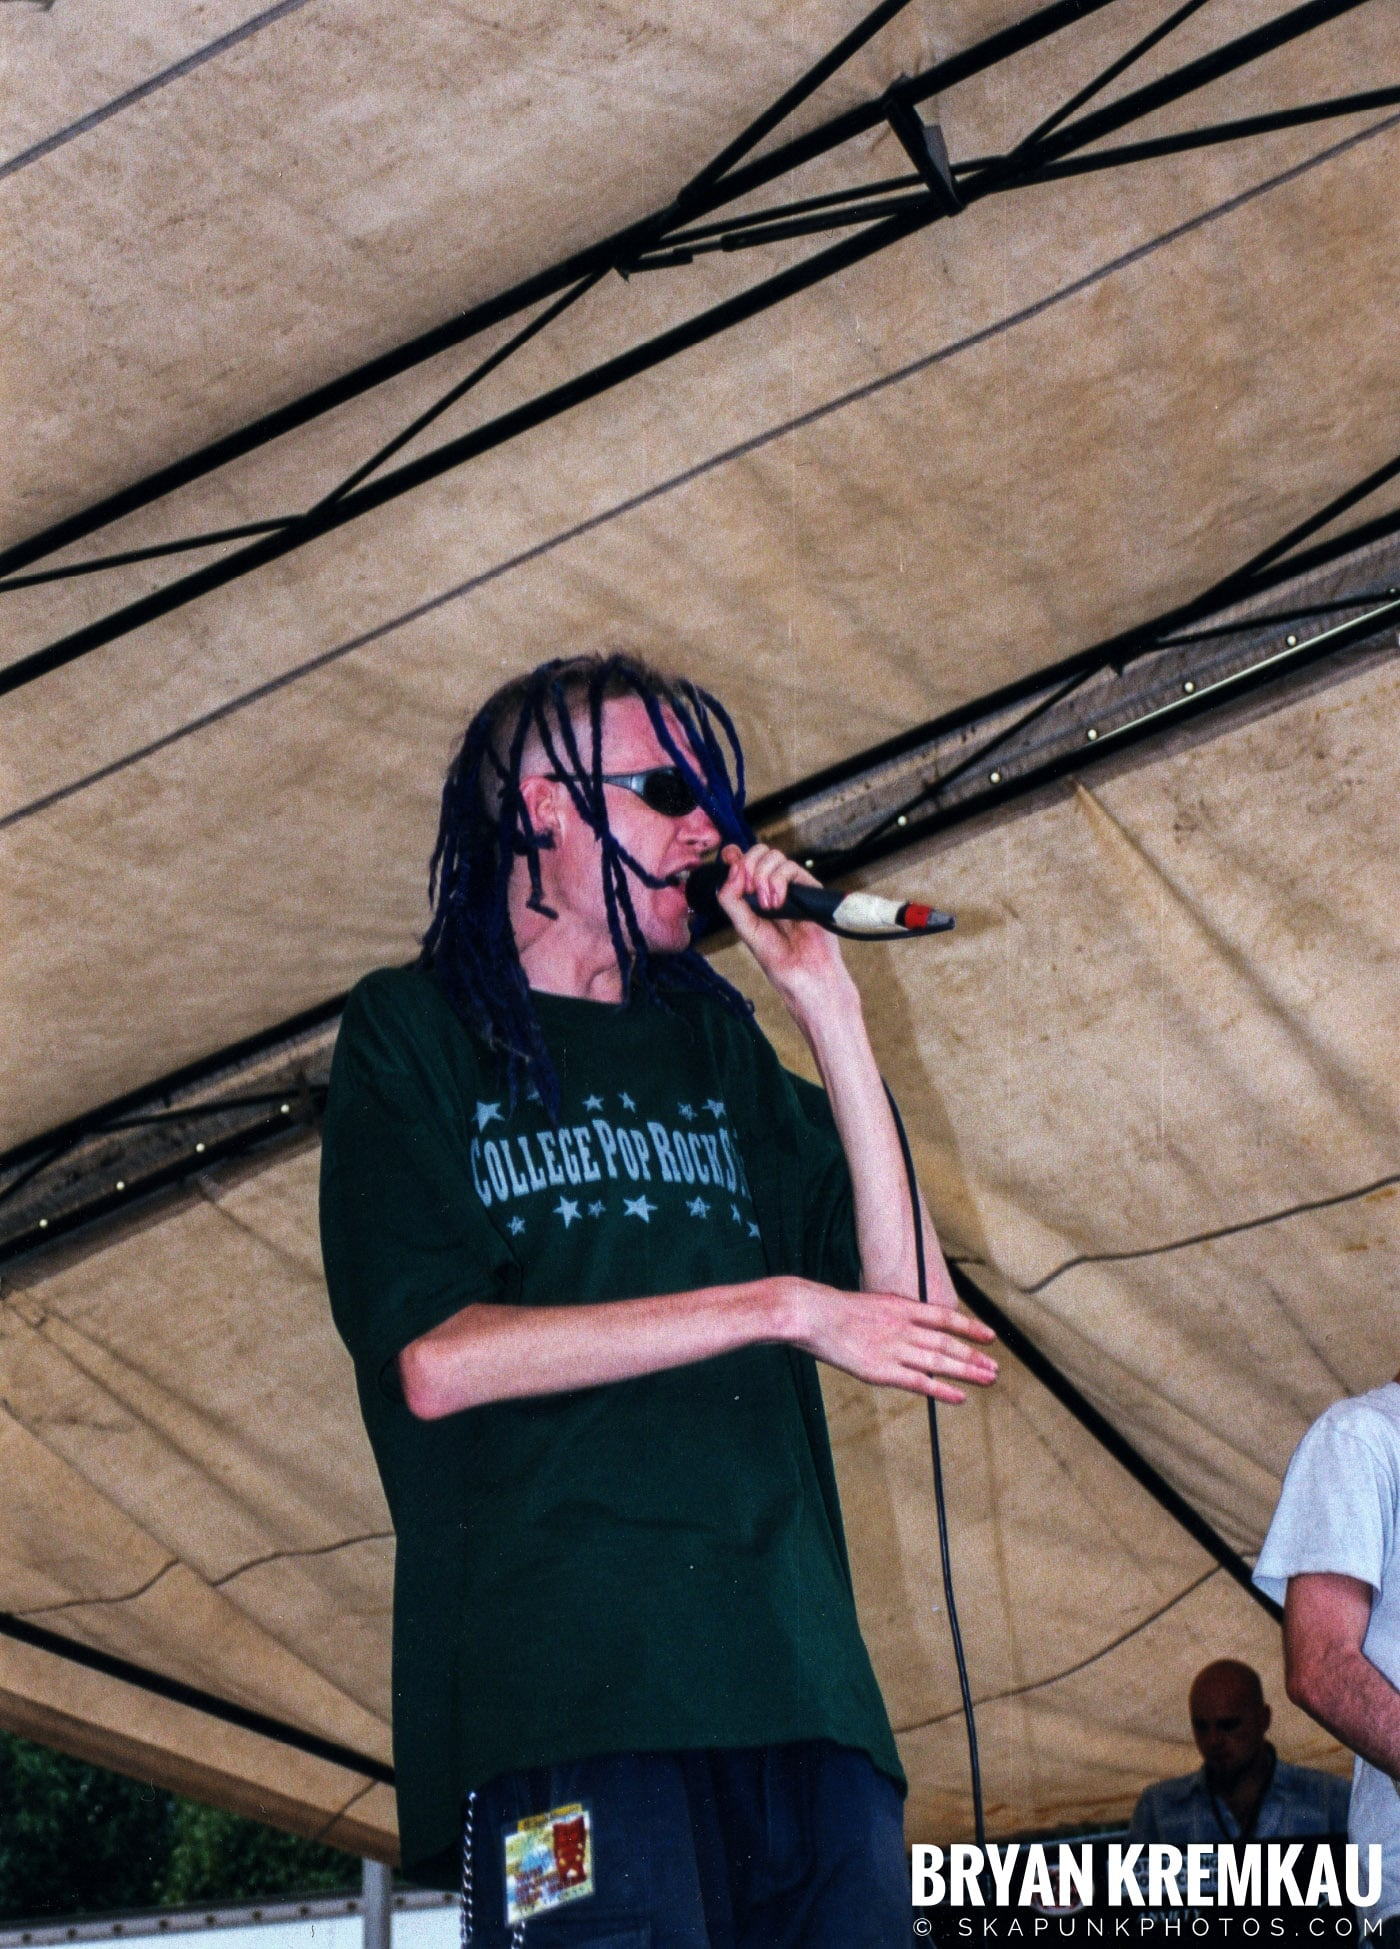 Frenzal Rhomb @ Vans Warped Tour, Randall's Island, NYC - 7.16.99 (4)